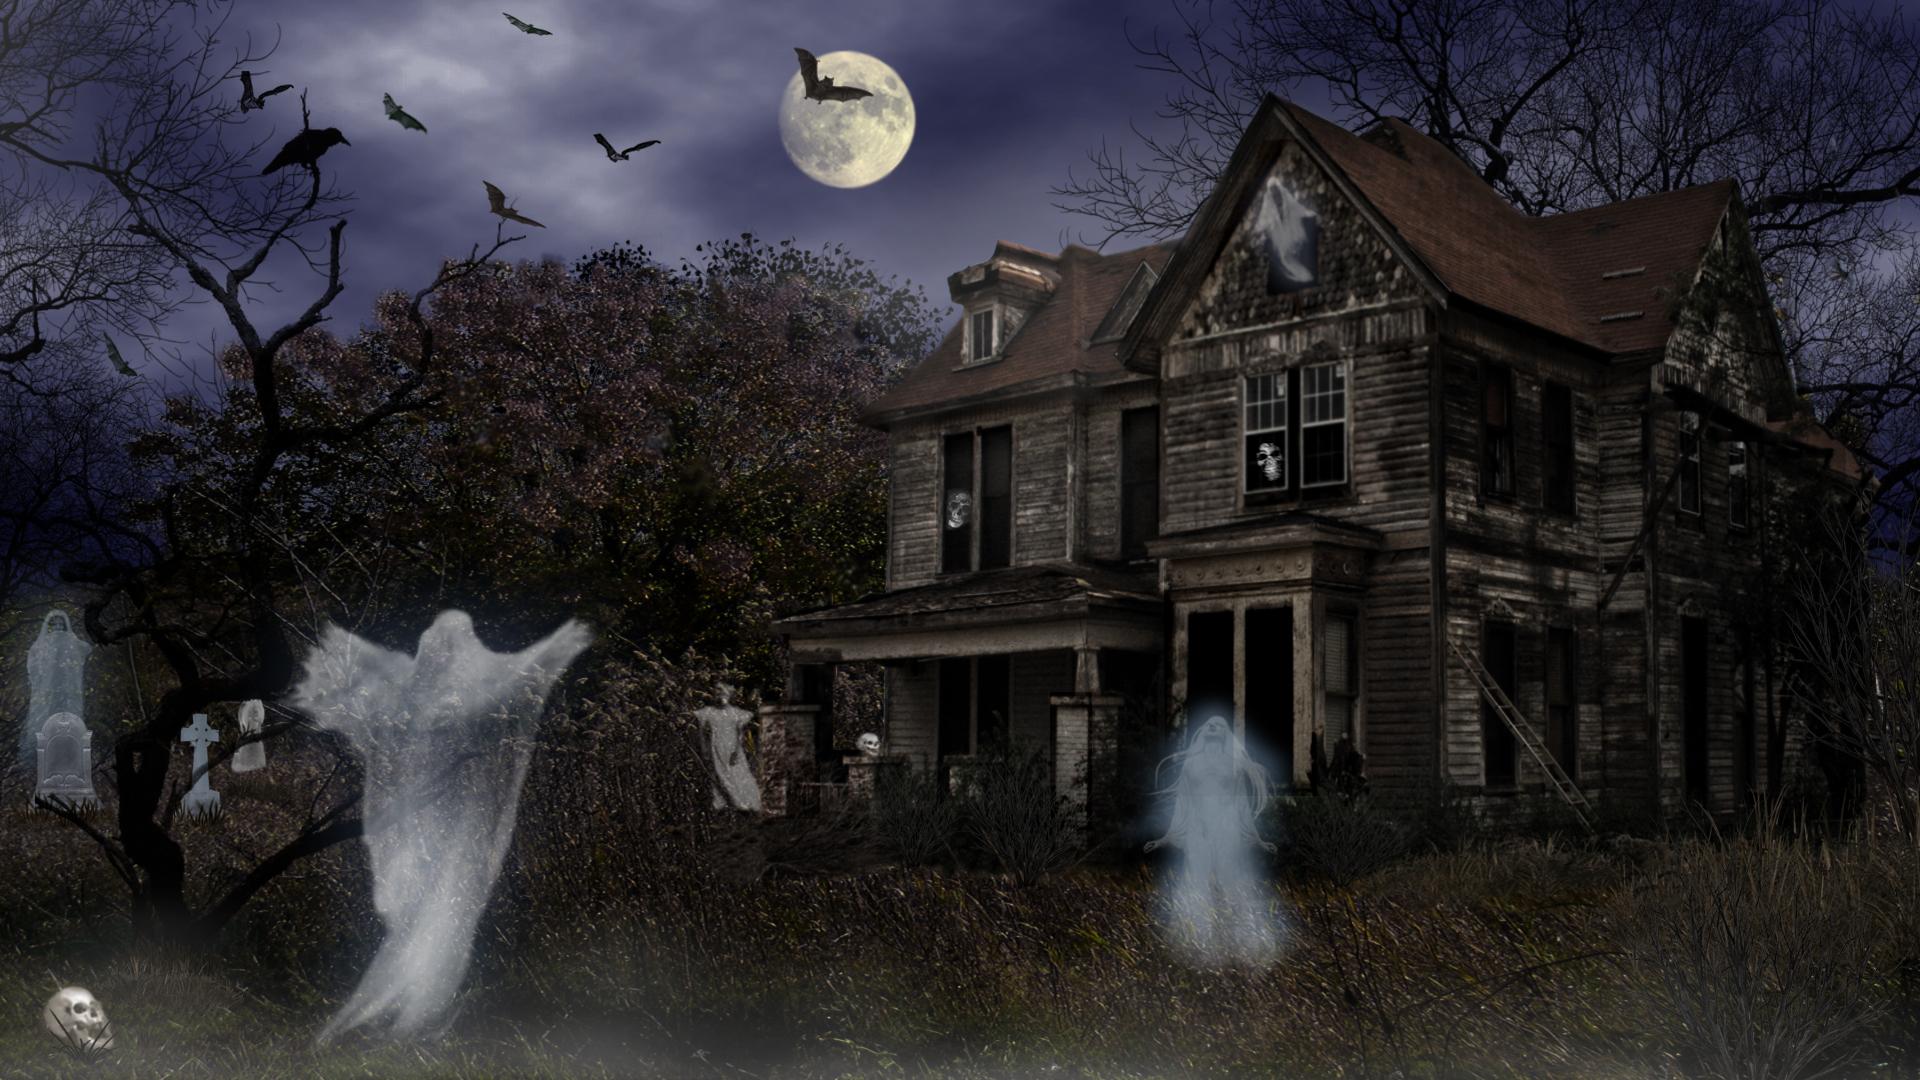 Screensavers Explore Haunted Mortuary Halloween wallpapers HD 1920x1080